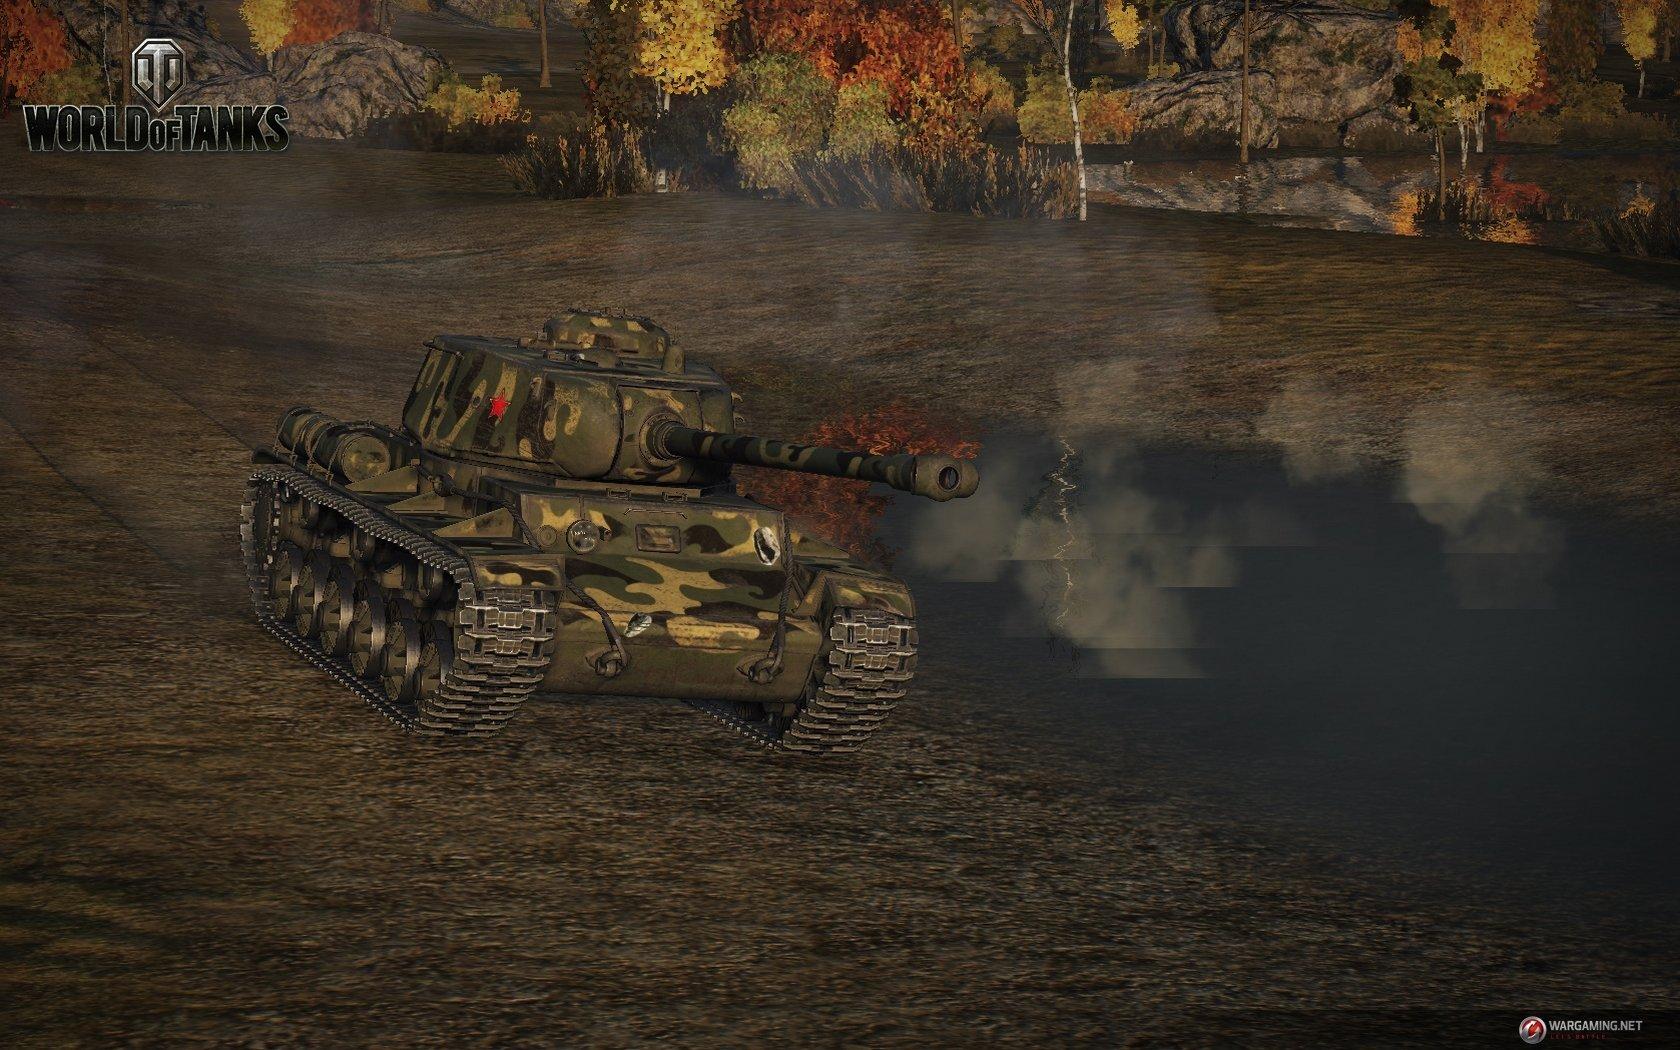 World of Tanks 9.3